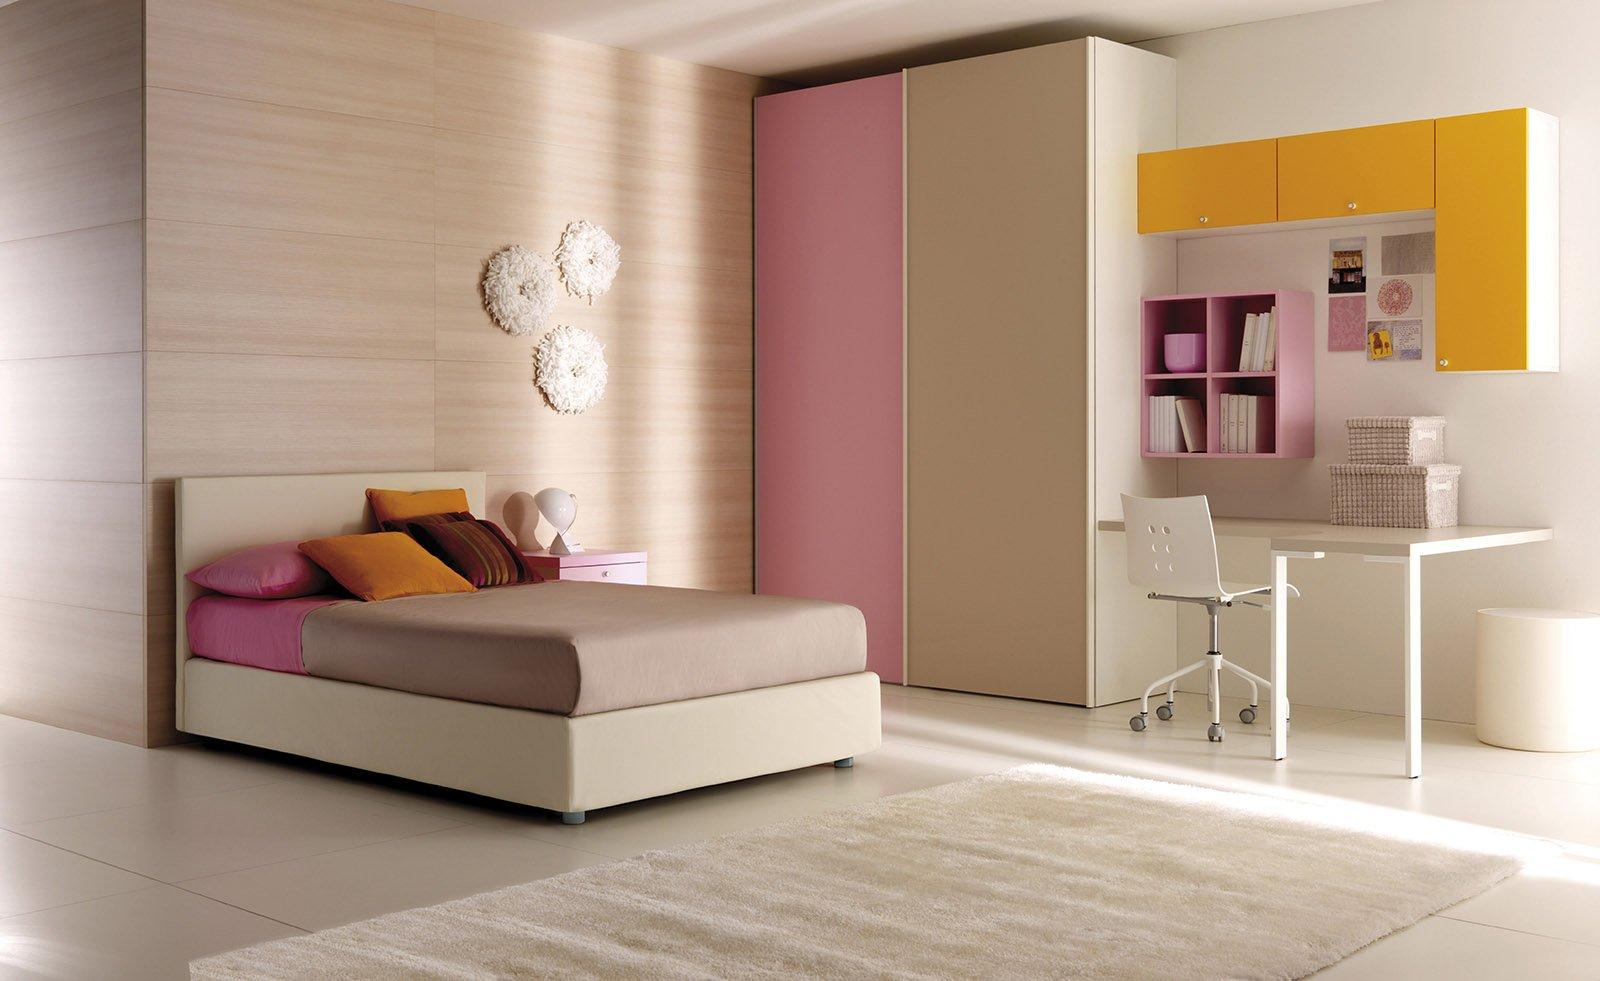 Camerette per adolescenti cose di casa - Camerette per stanze piccole ...